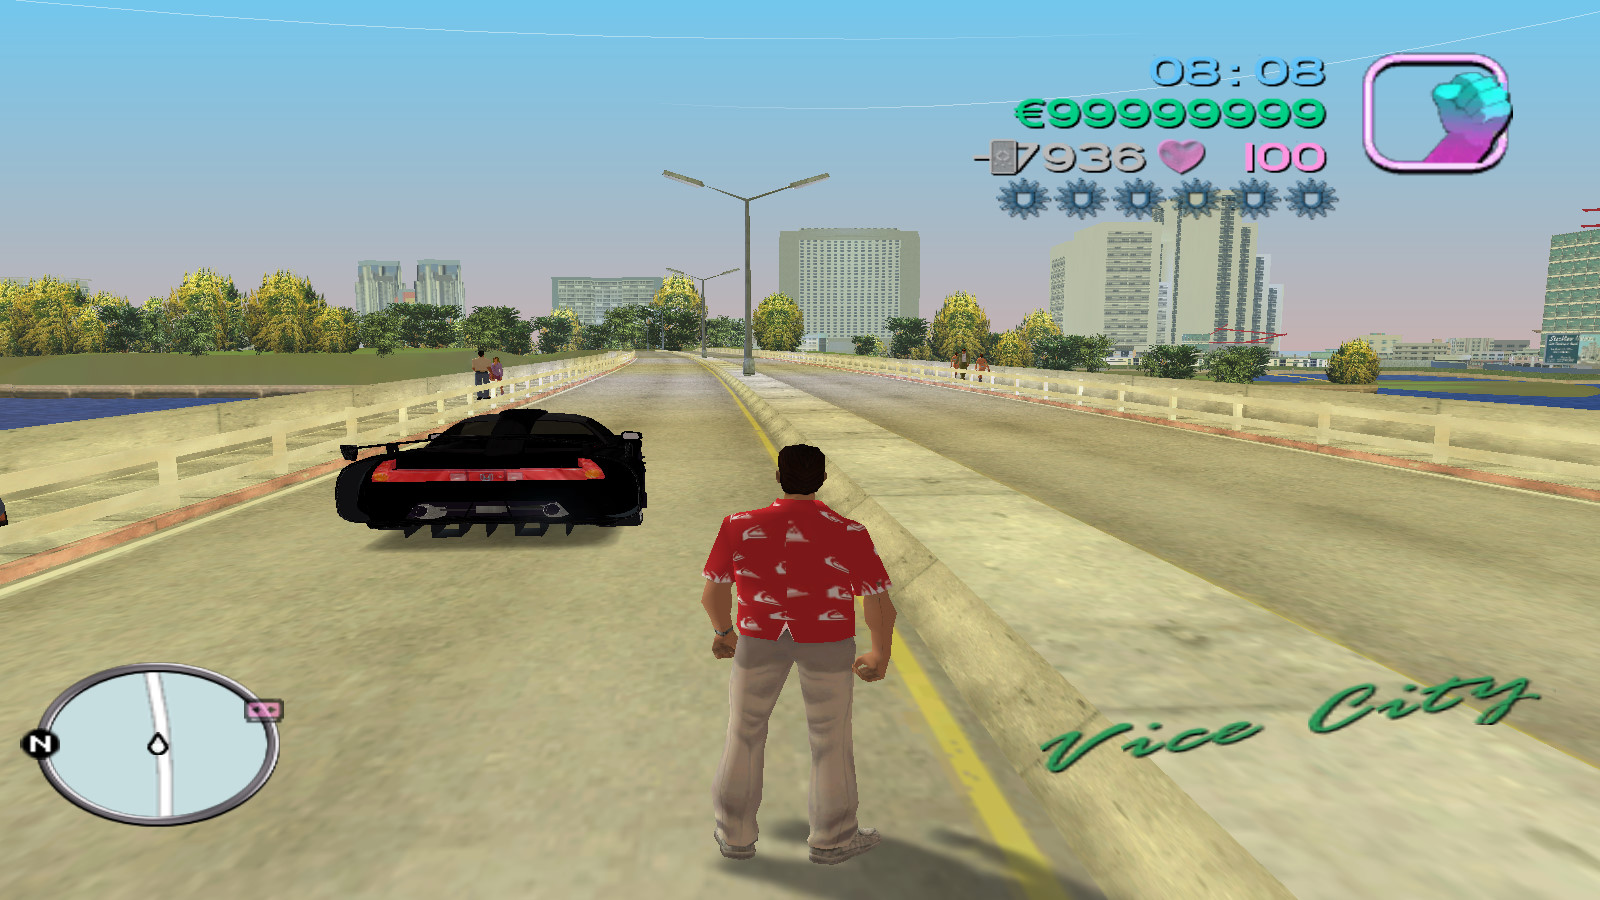 Tommy Vercetti standing on bridge in GTA Vice City